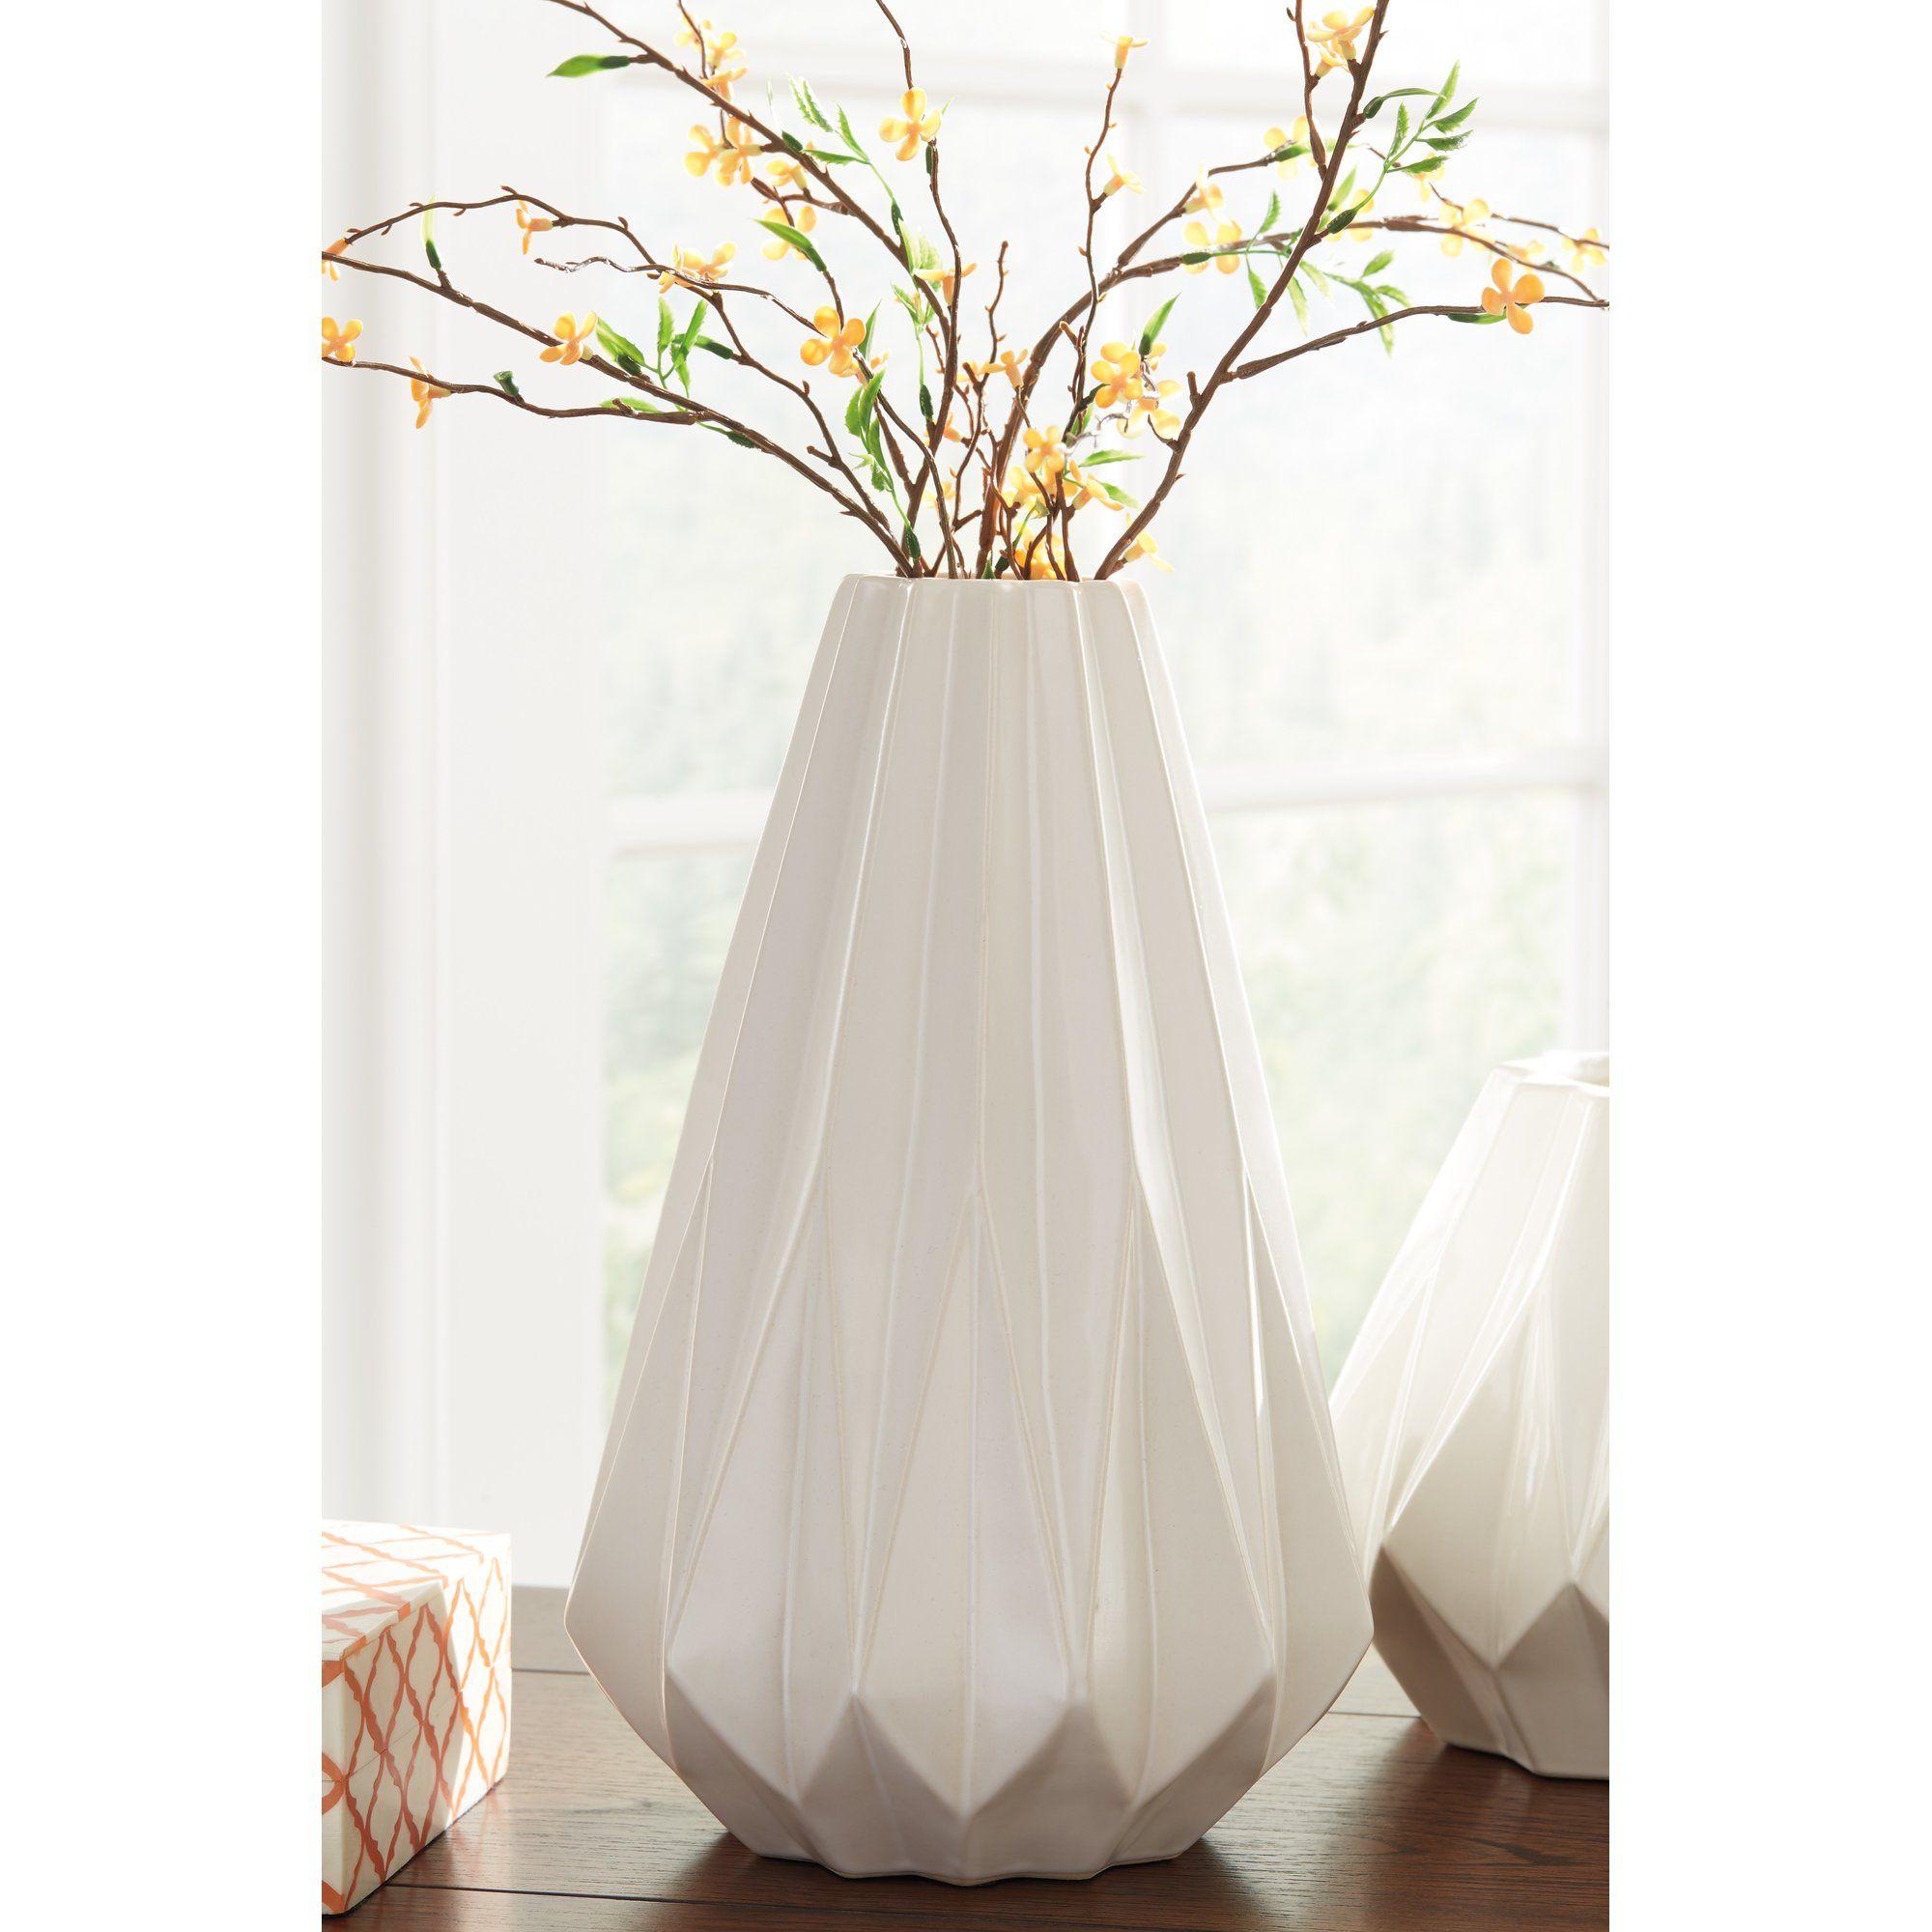 Free Home Interiordecorating Ideas: Signature Design By Ashley